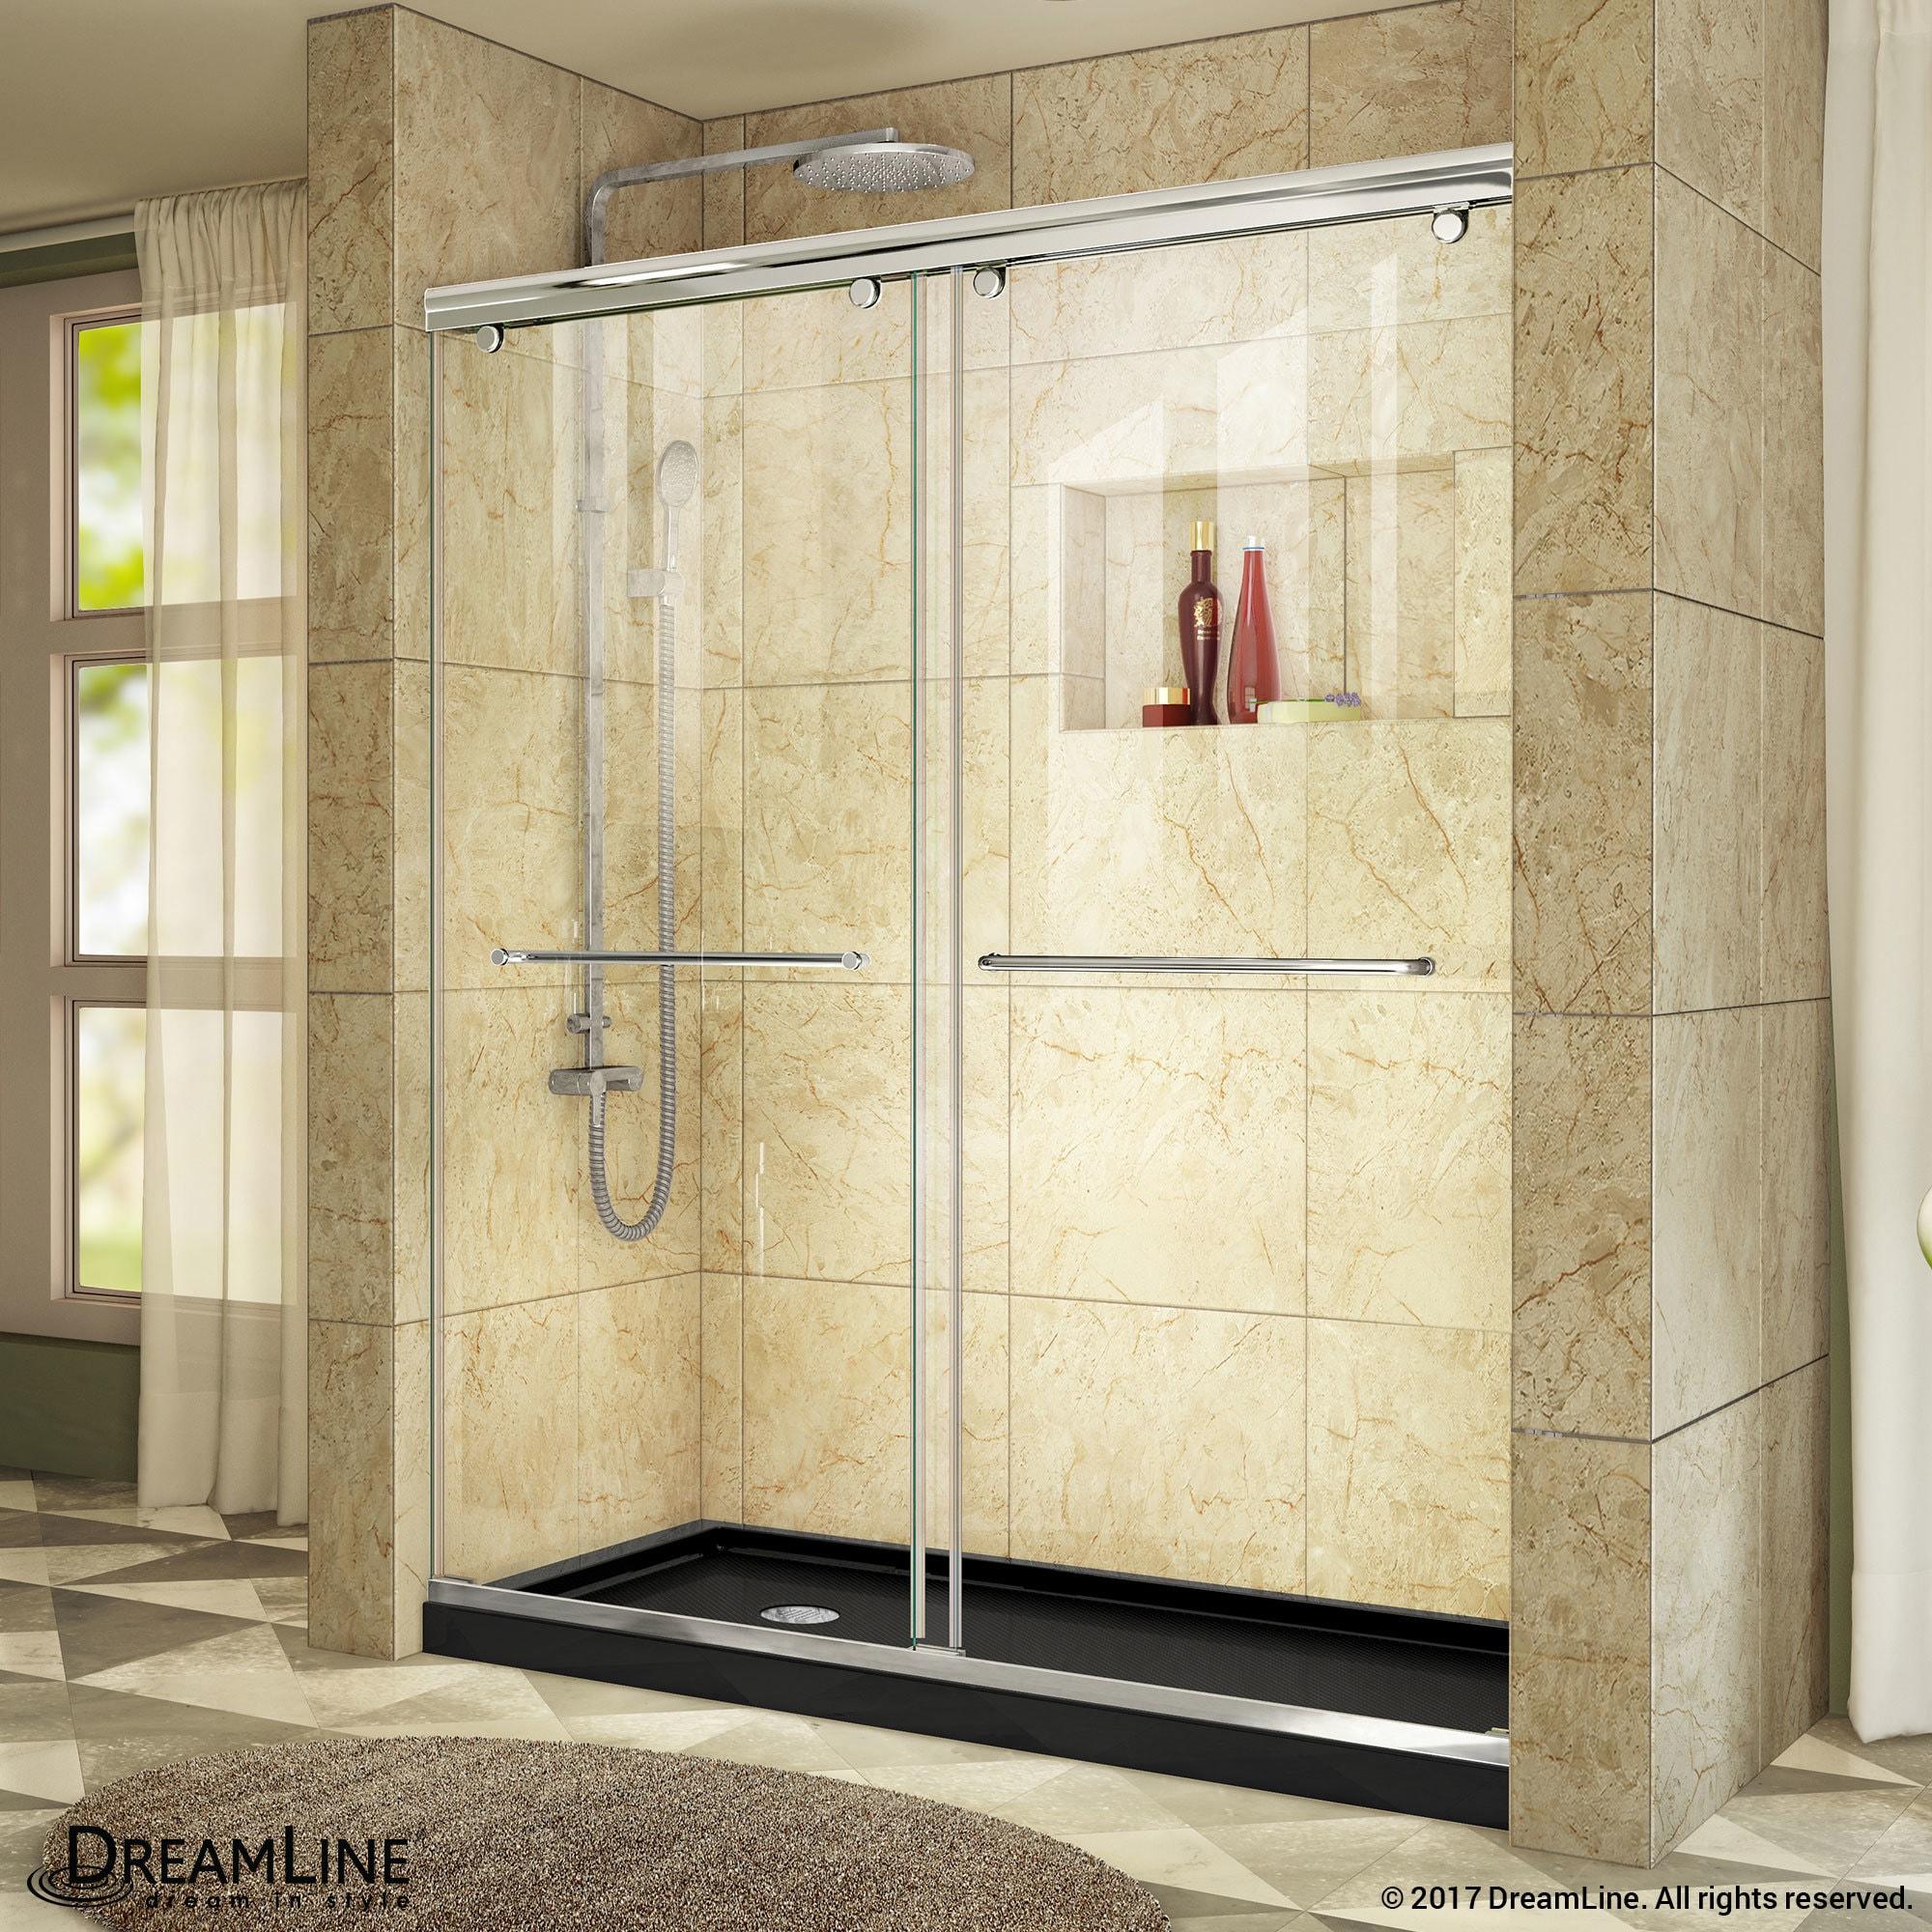 Shop DreamLine Charisma Sliding Shower Door 56 - 60 in. W x 76 in. H ...